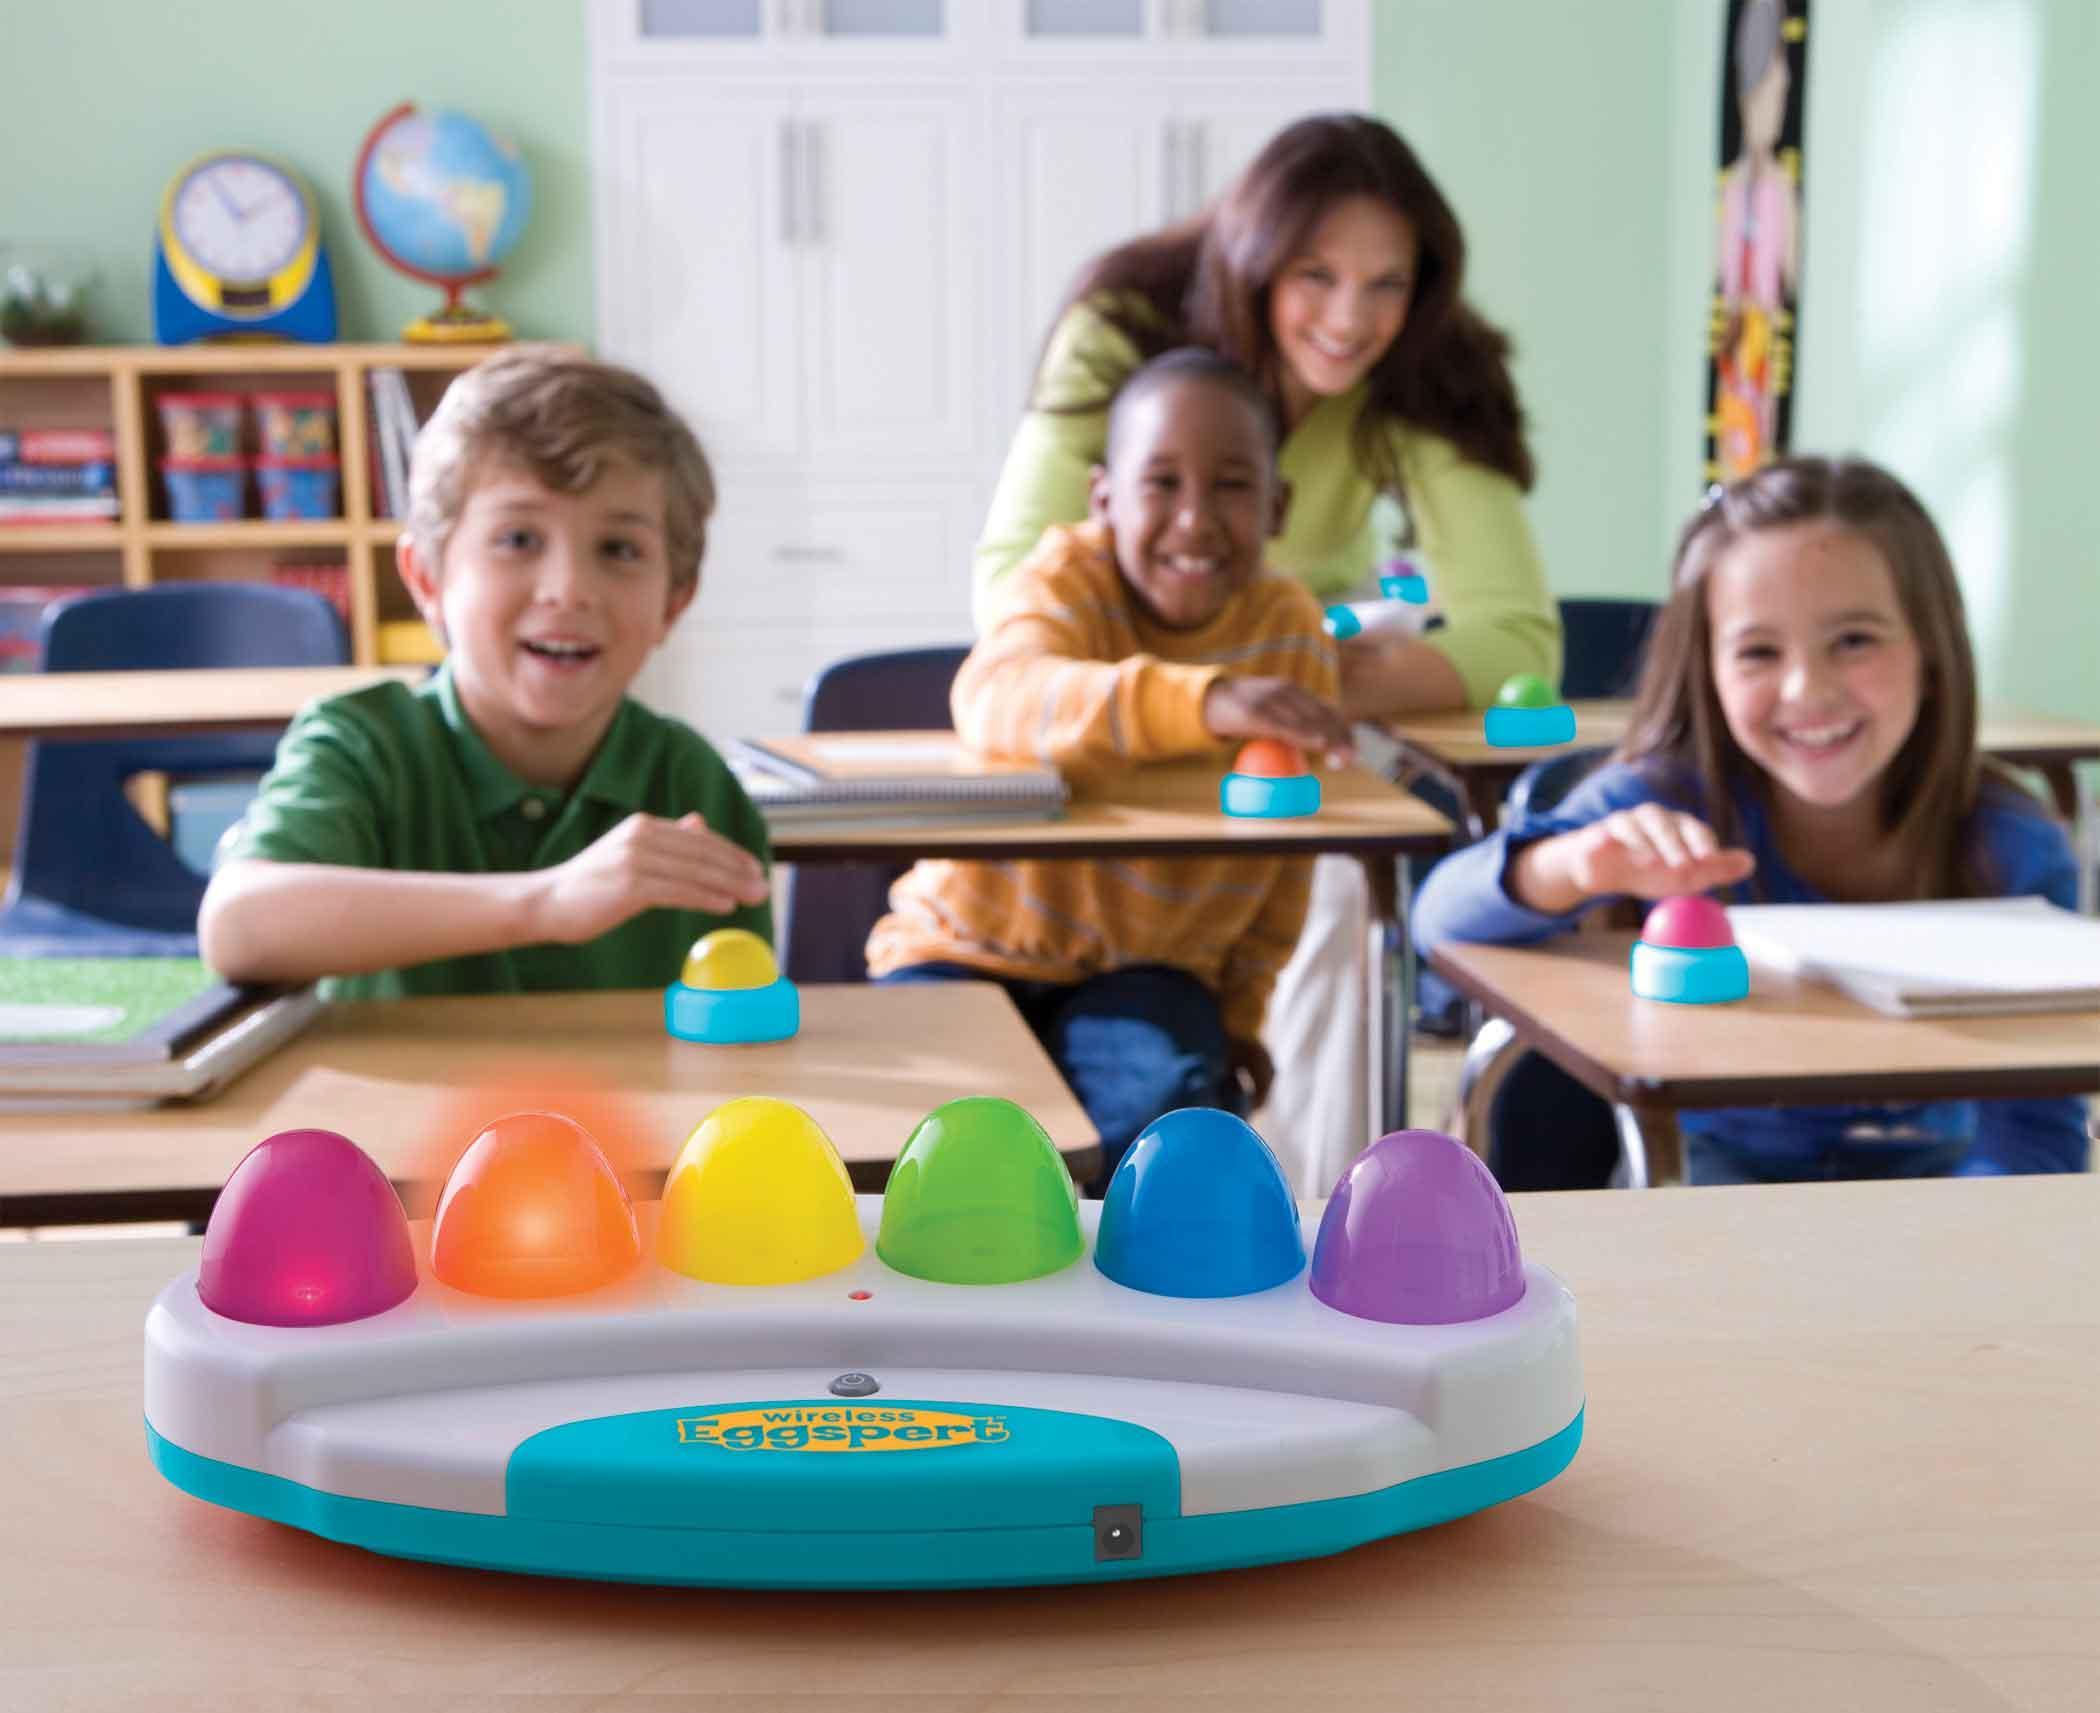 aftershock game educational insights eggspert amazon